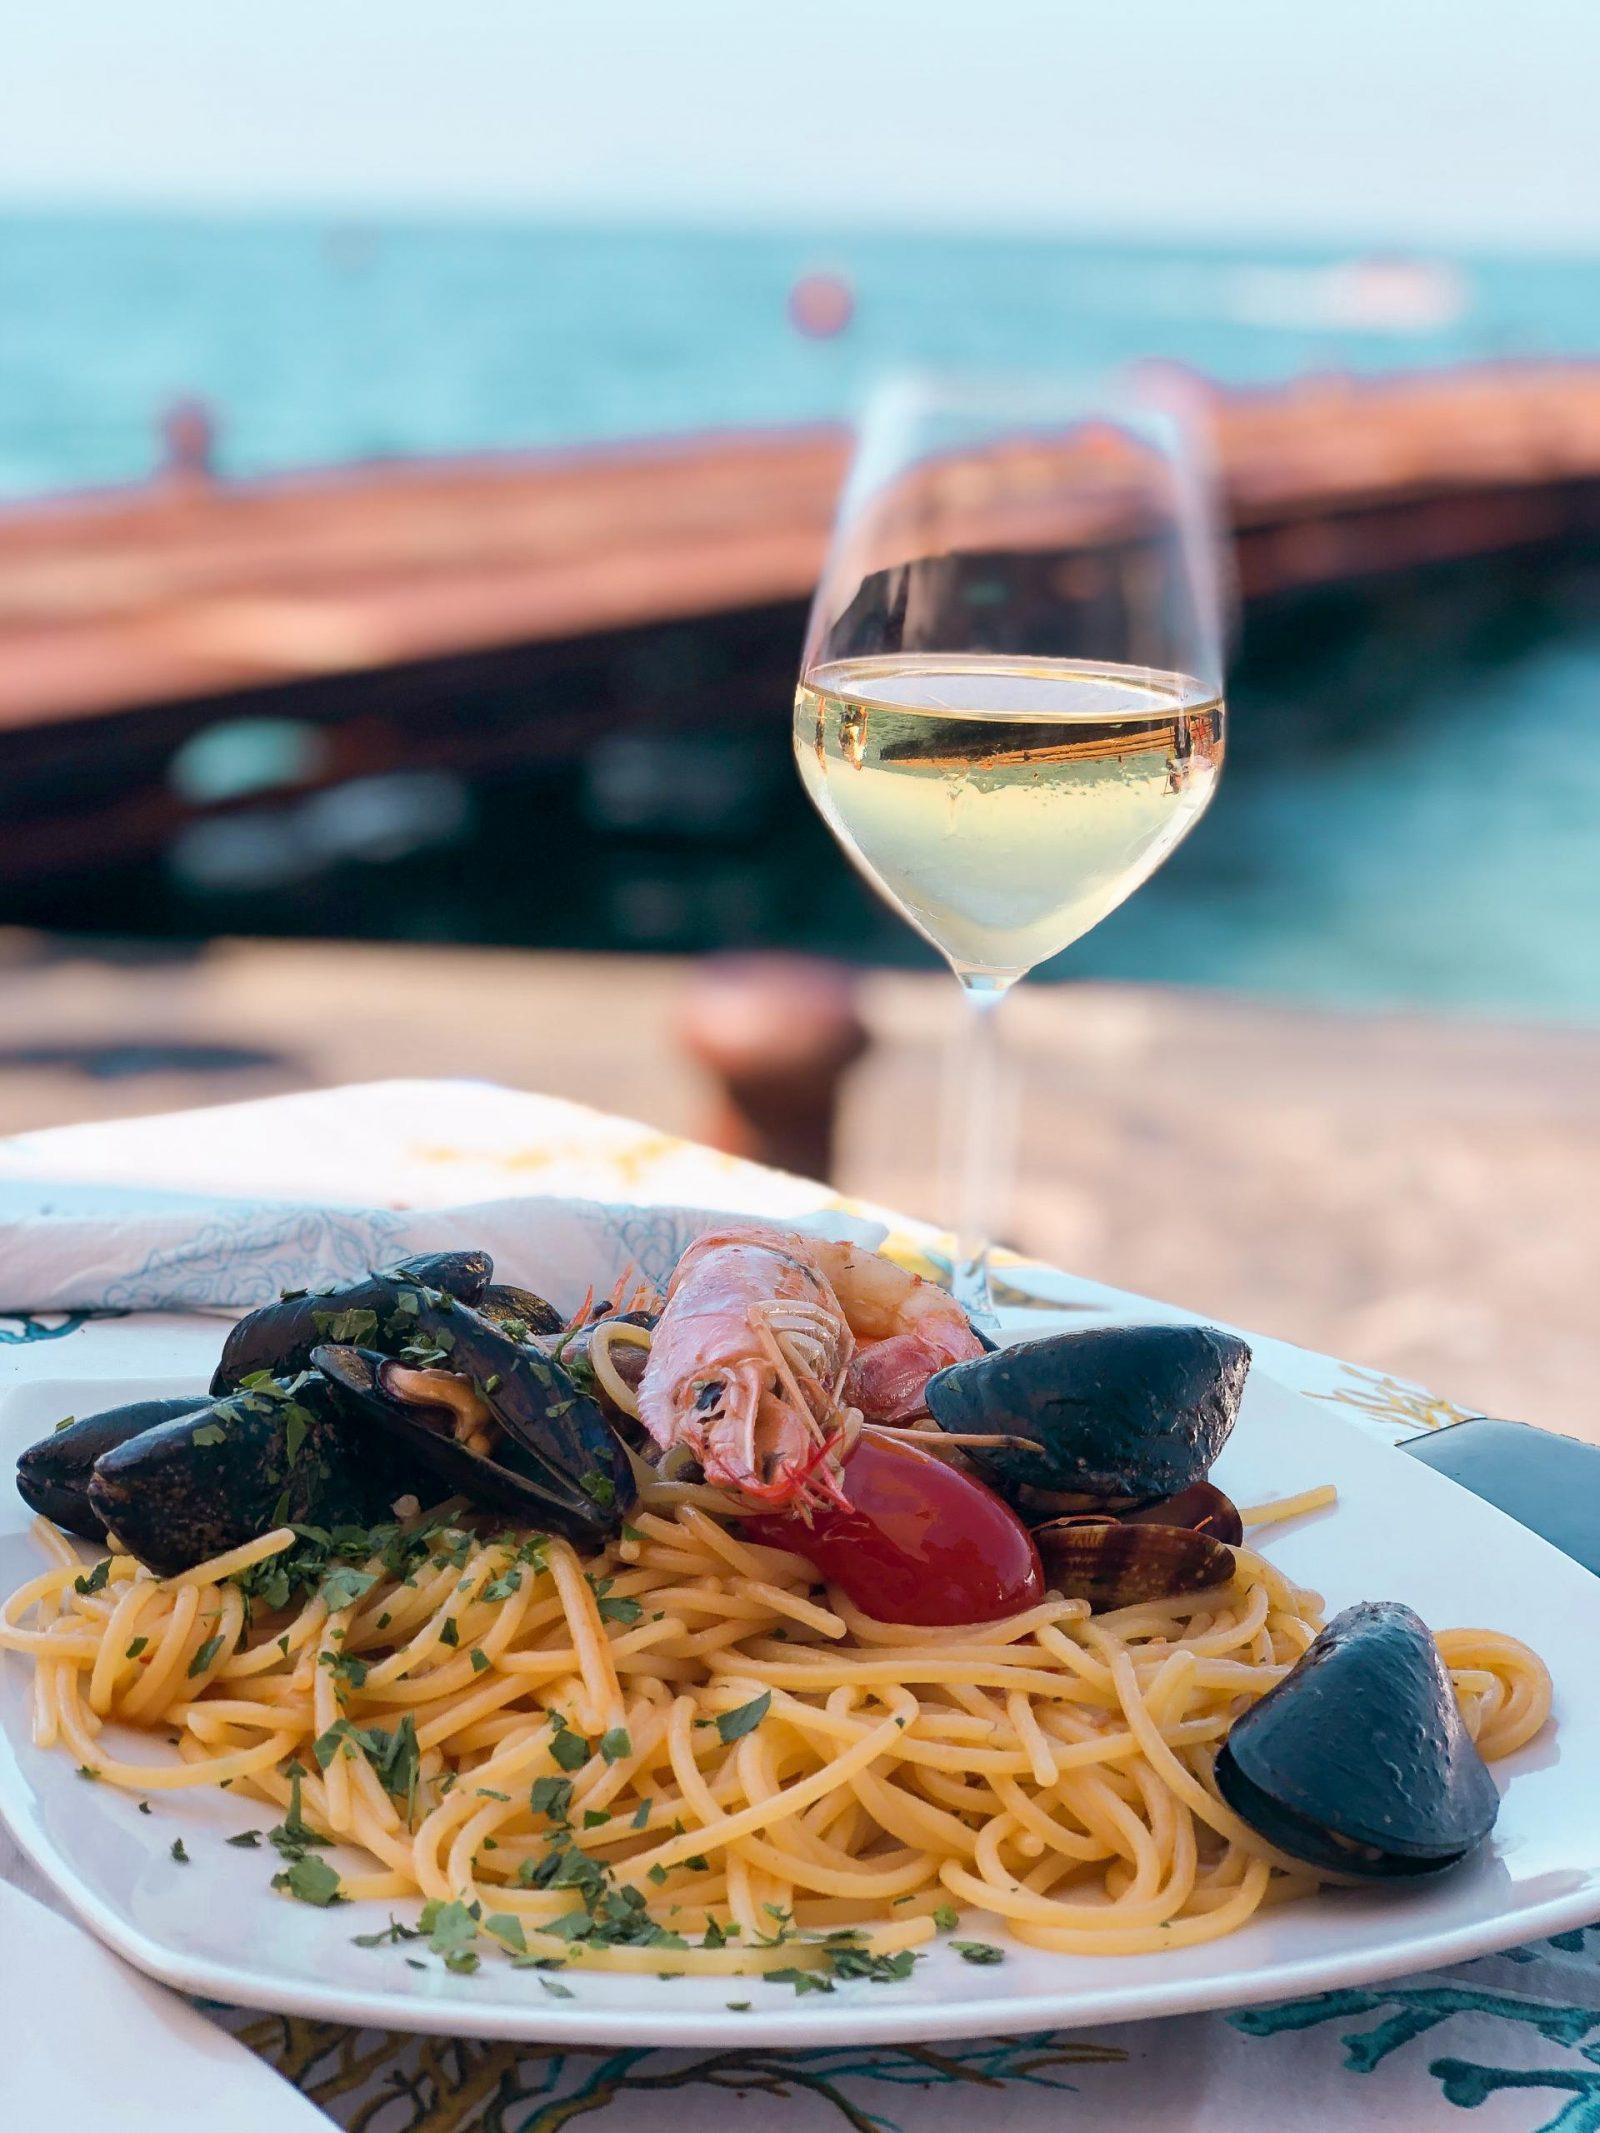 Seafood Linguine from Porta Marina Seafood, Sorrento